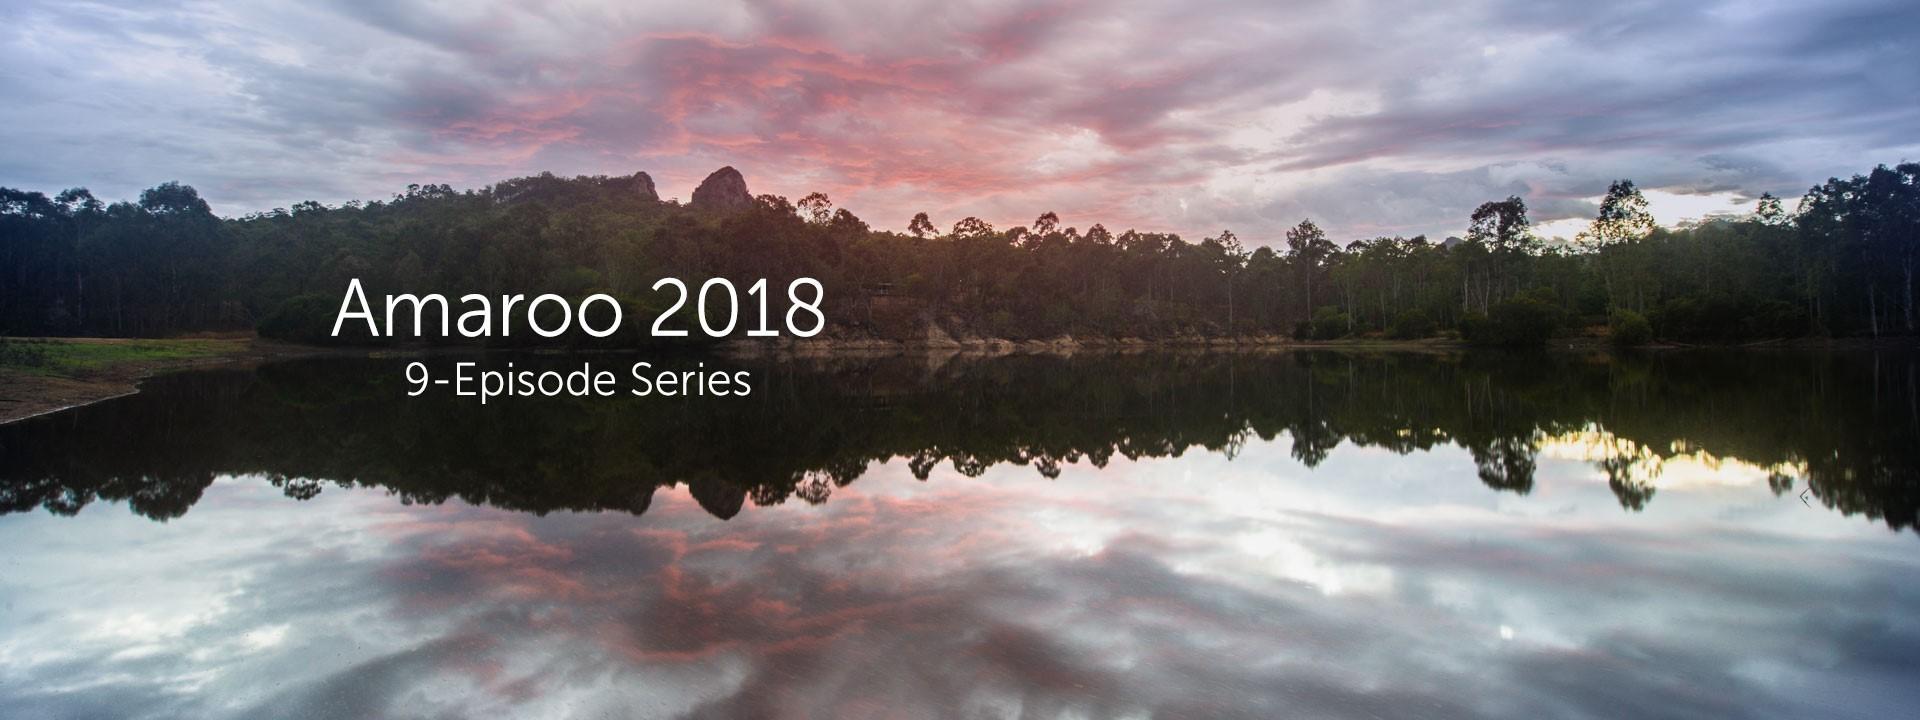 Amaroo 2018 Episode 1 (Audio)